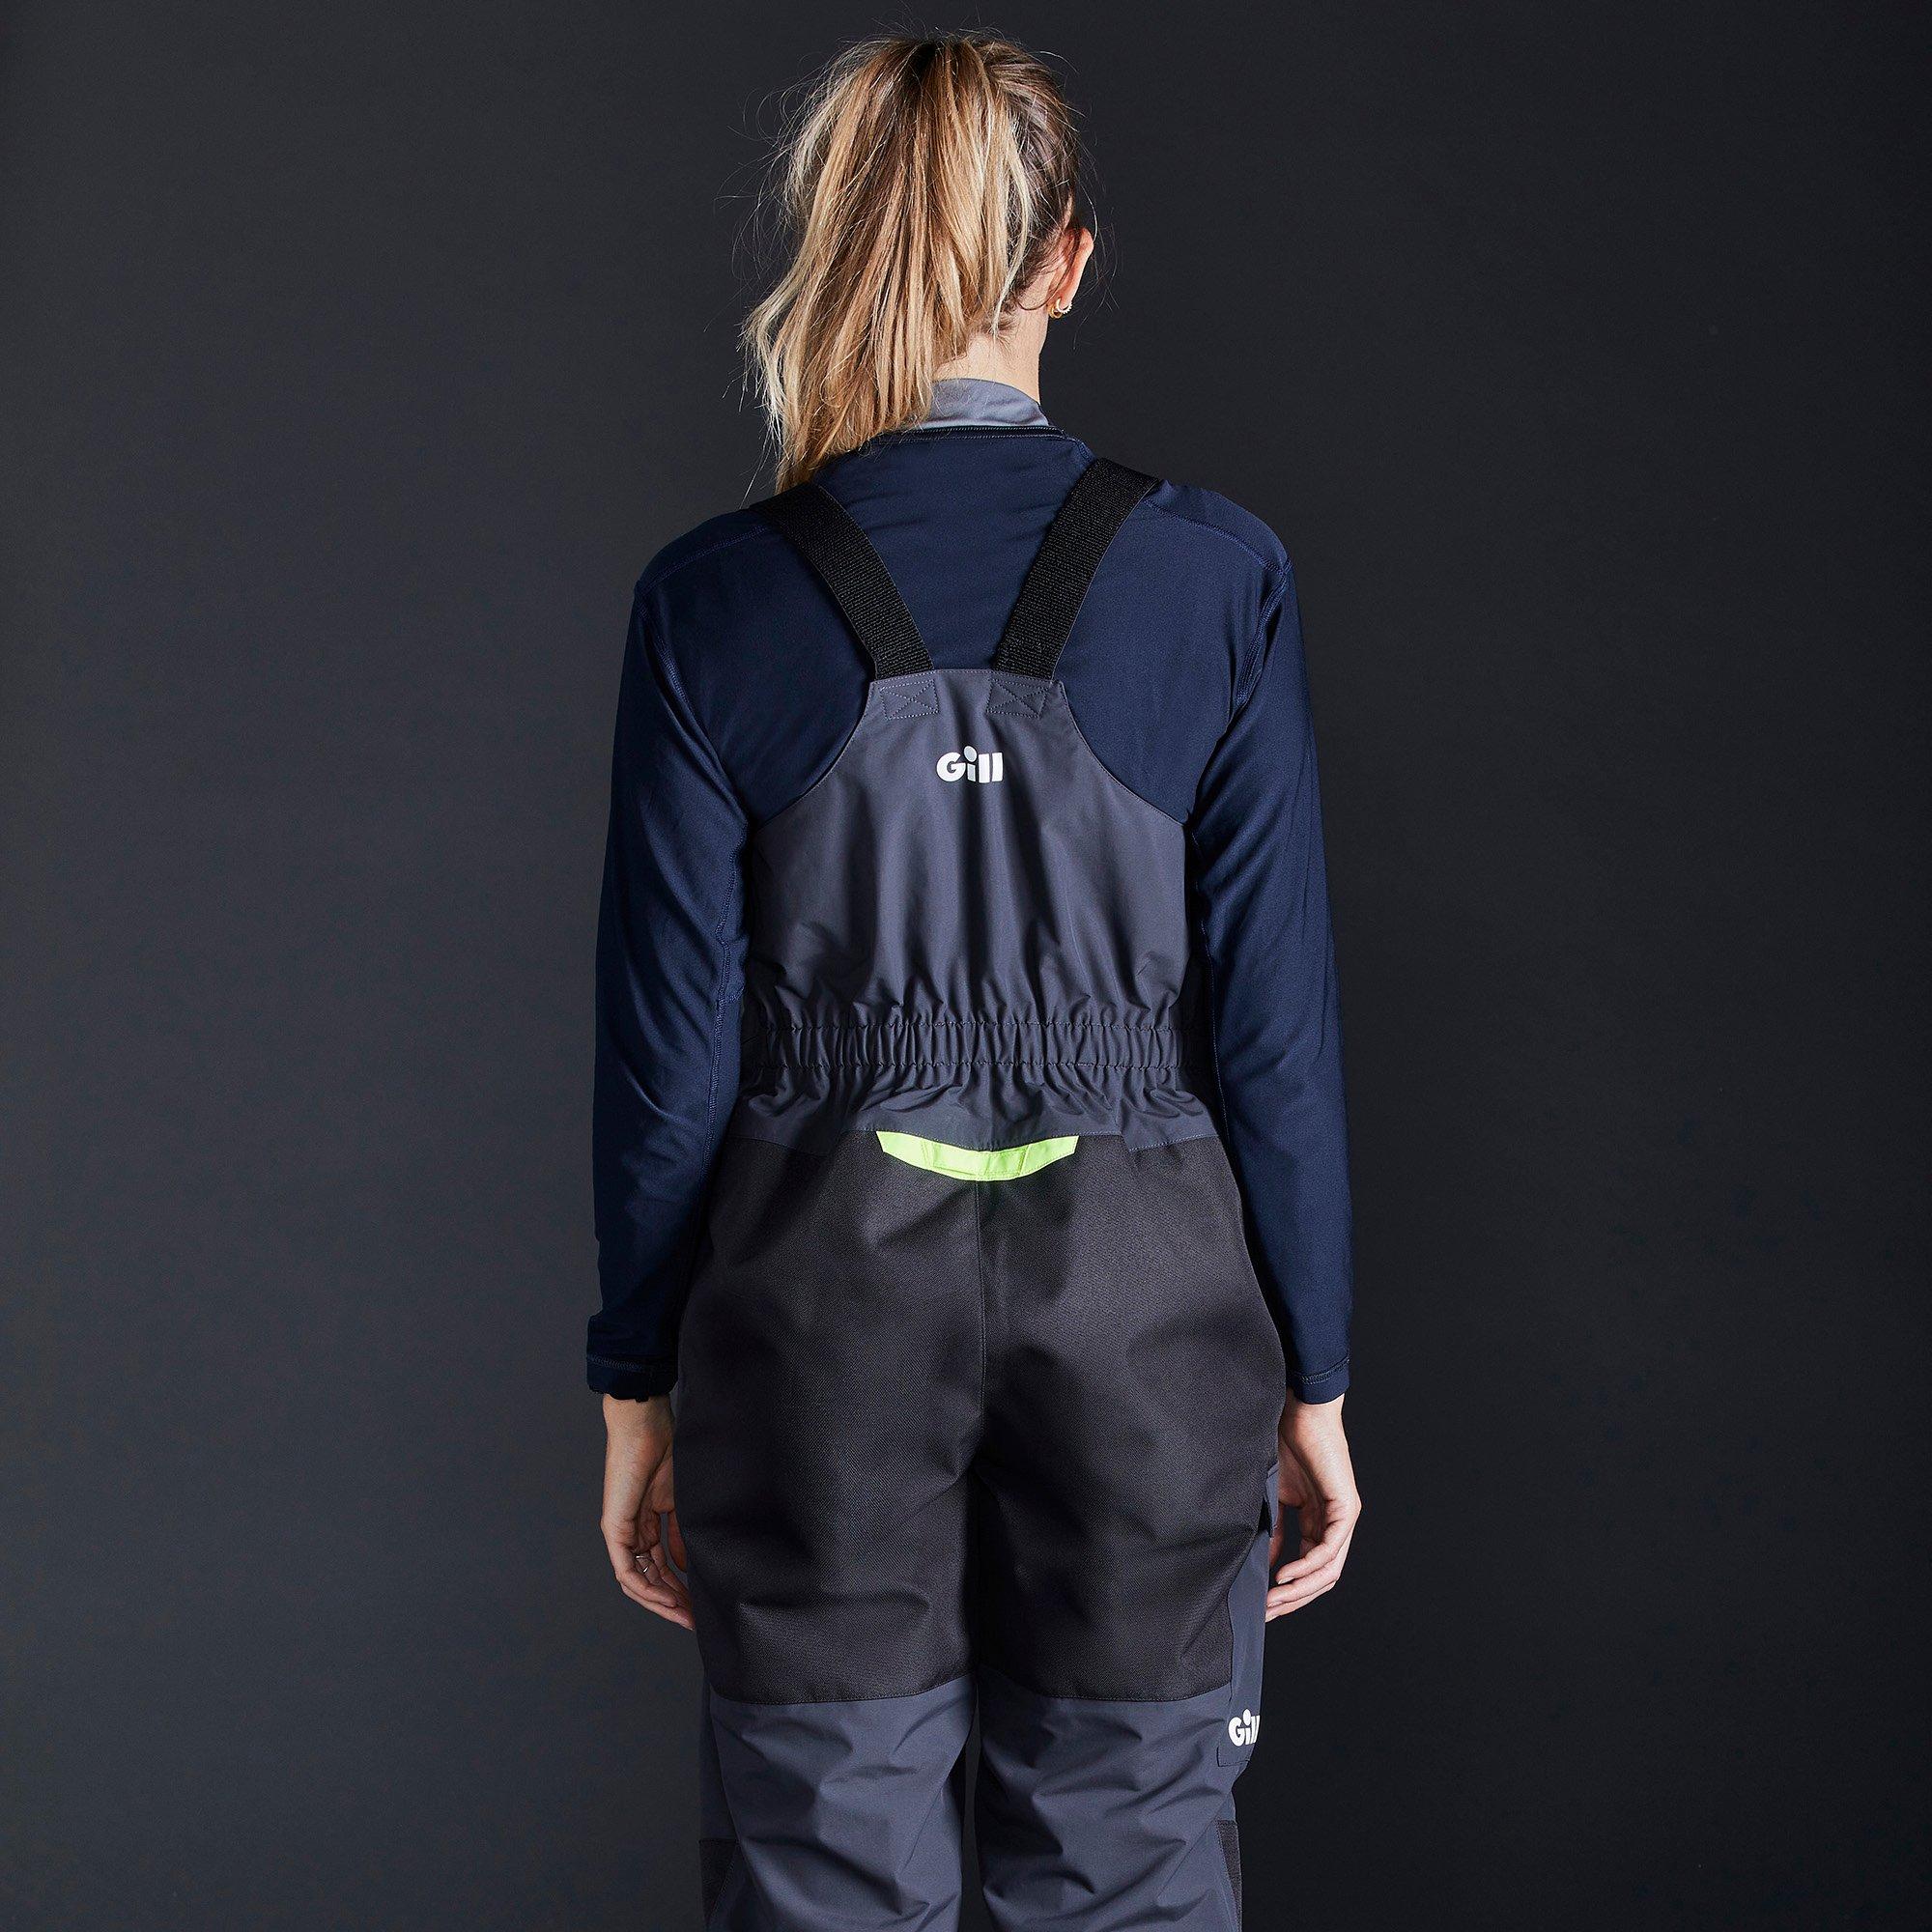 Women's OS3 Coastal Trousers - OS32TW-GRA01-MODEL_3.jpg